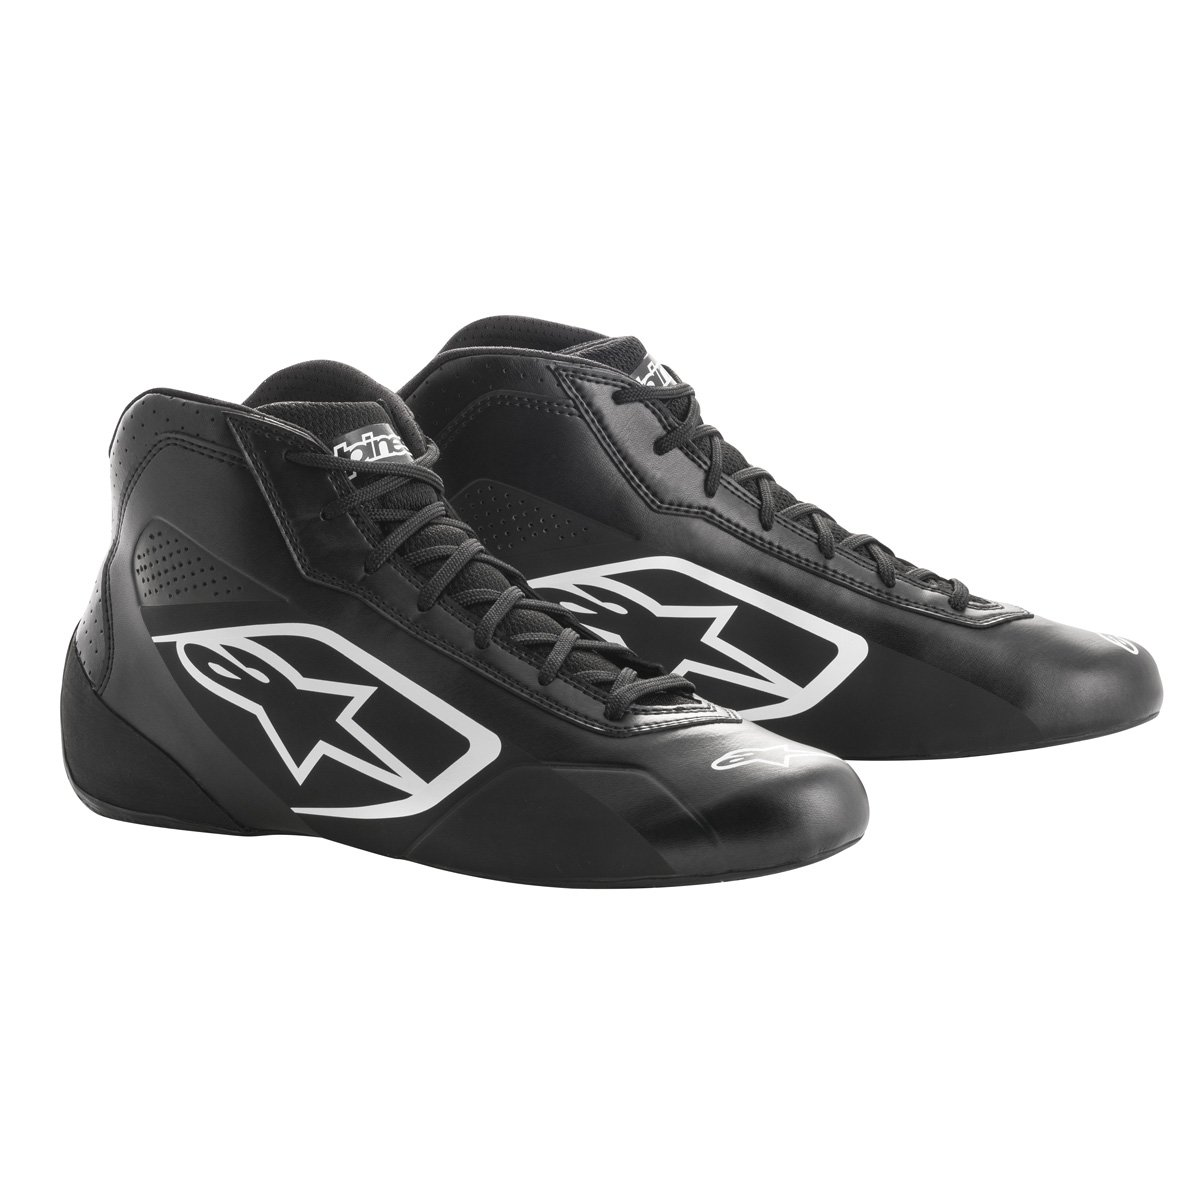 Alpinestars 2711518-12B-12 Tech 1-K Start Shoes, Black/White, Size 12